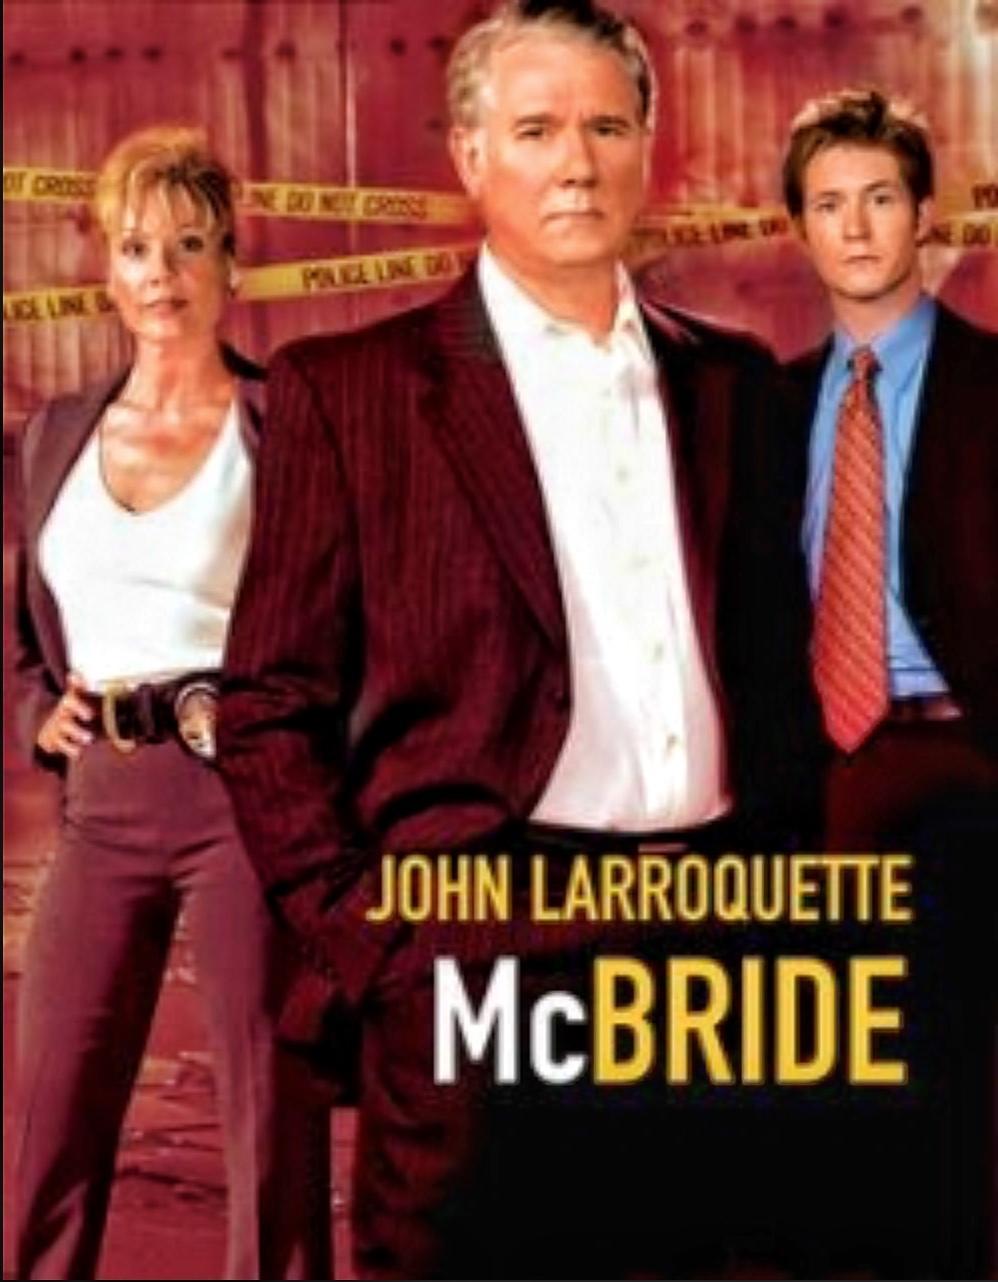 McBride: Gyilkosság volt, hölgyem /McBride: It's Murder, Madam/